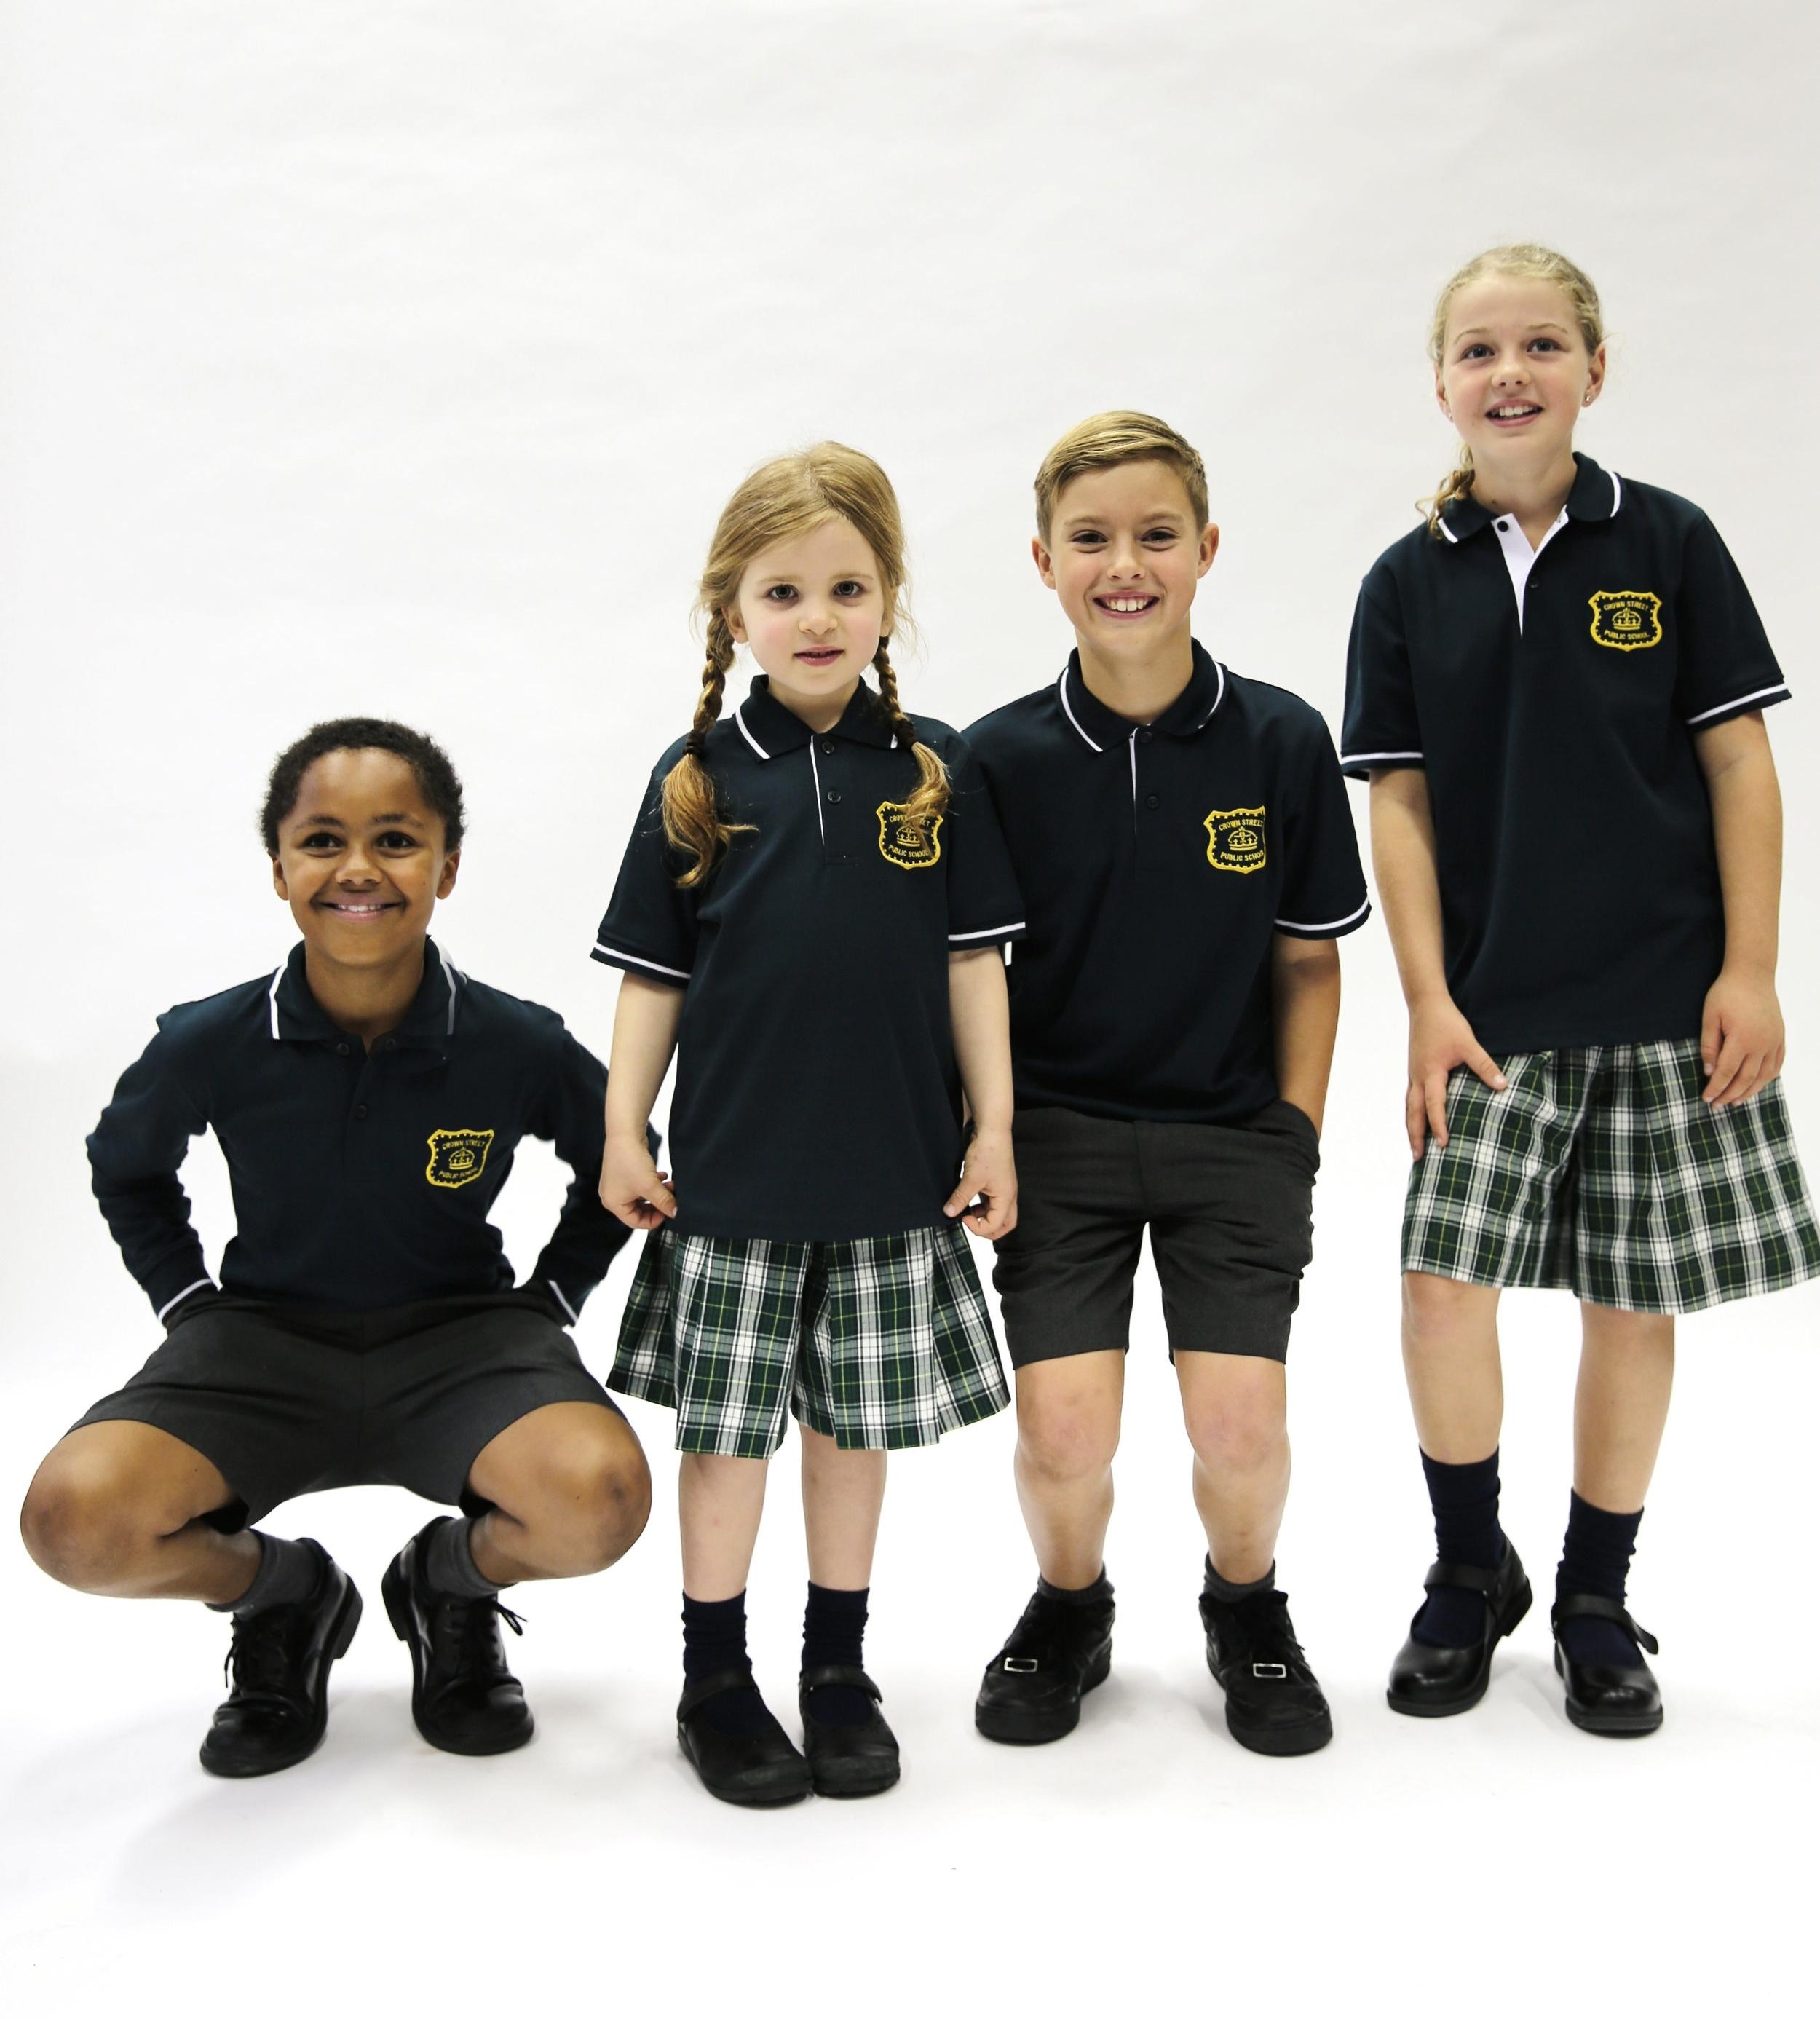 Summer Uniforms worn with navy socks